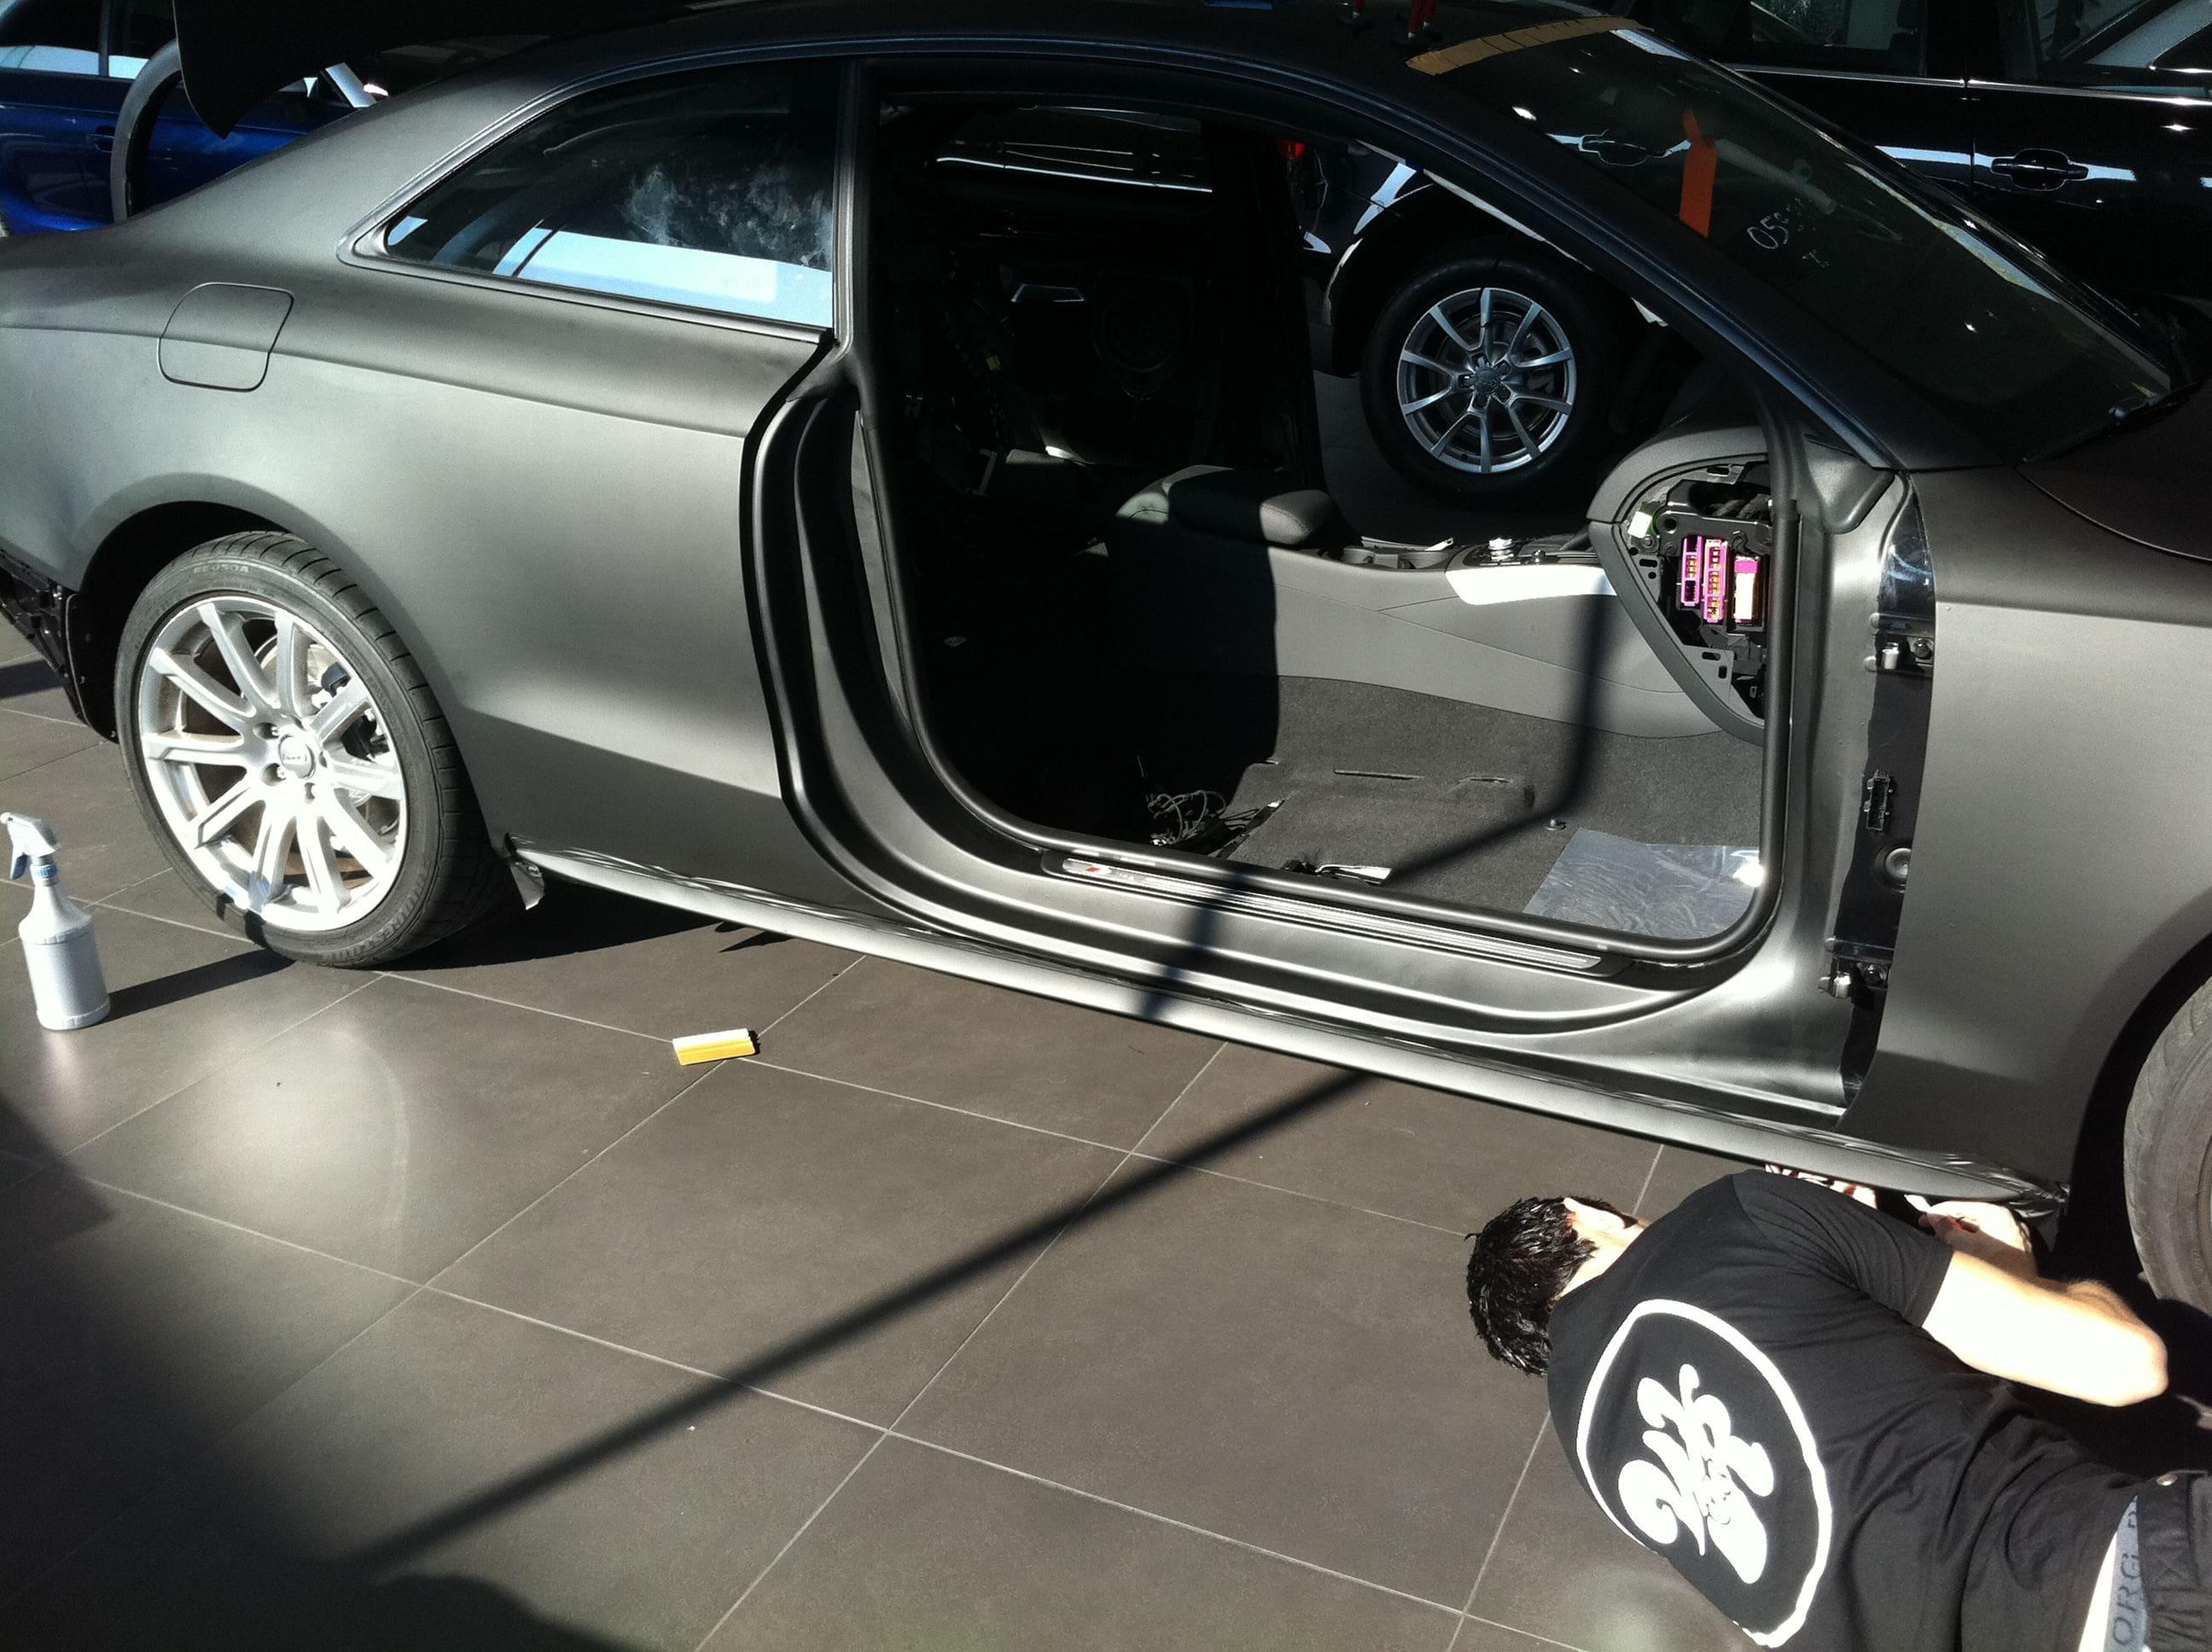 Audi A5 Coupe met Mat Zwarte Wrap, Carwrapping door Wrapmyride.nu Foto-nr:4573, ©2021